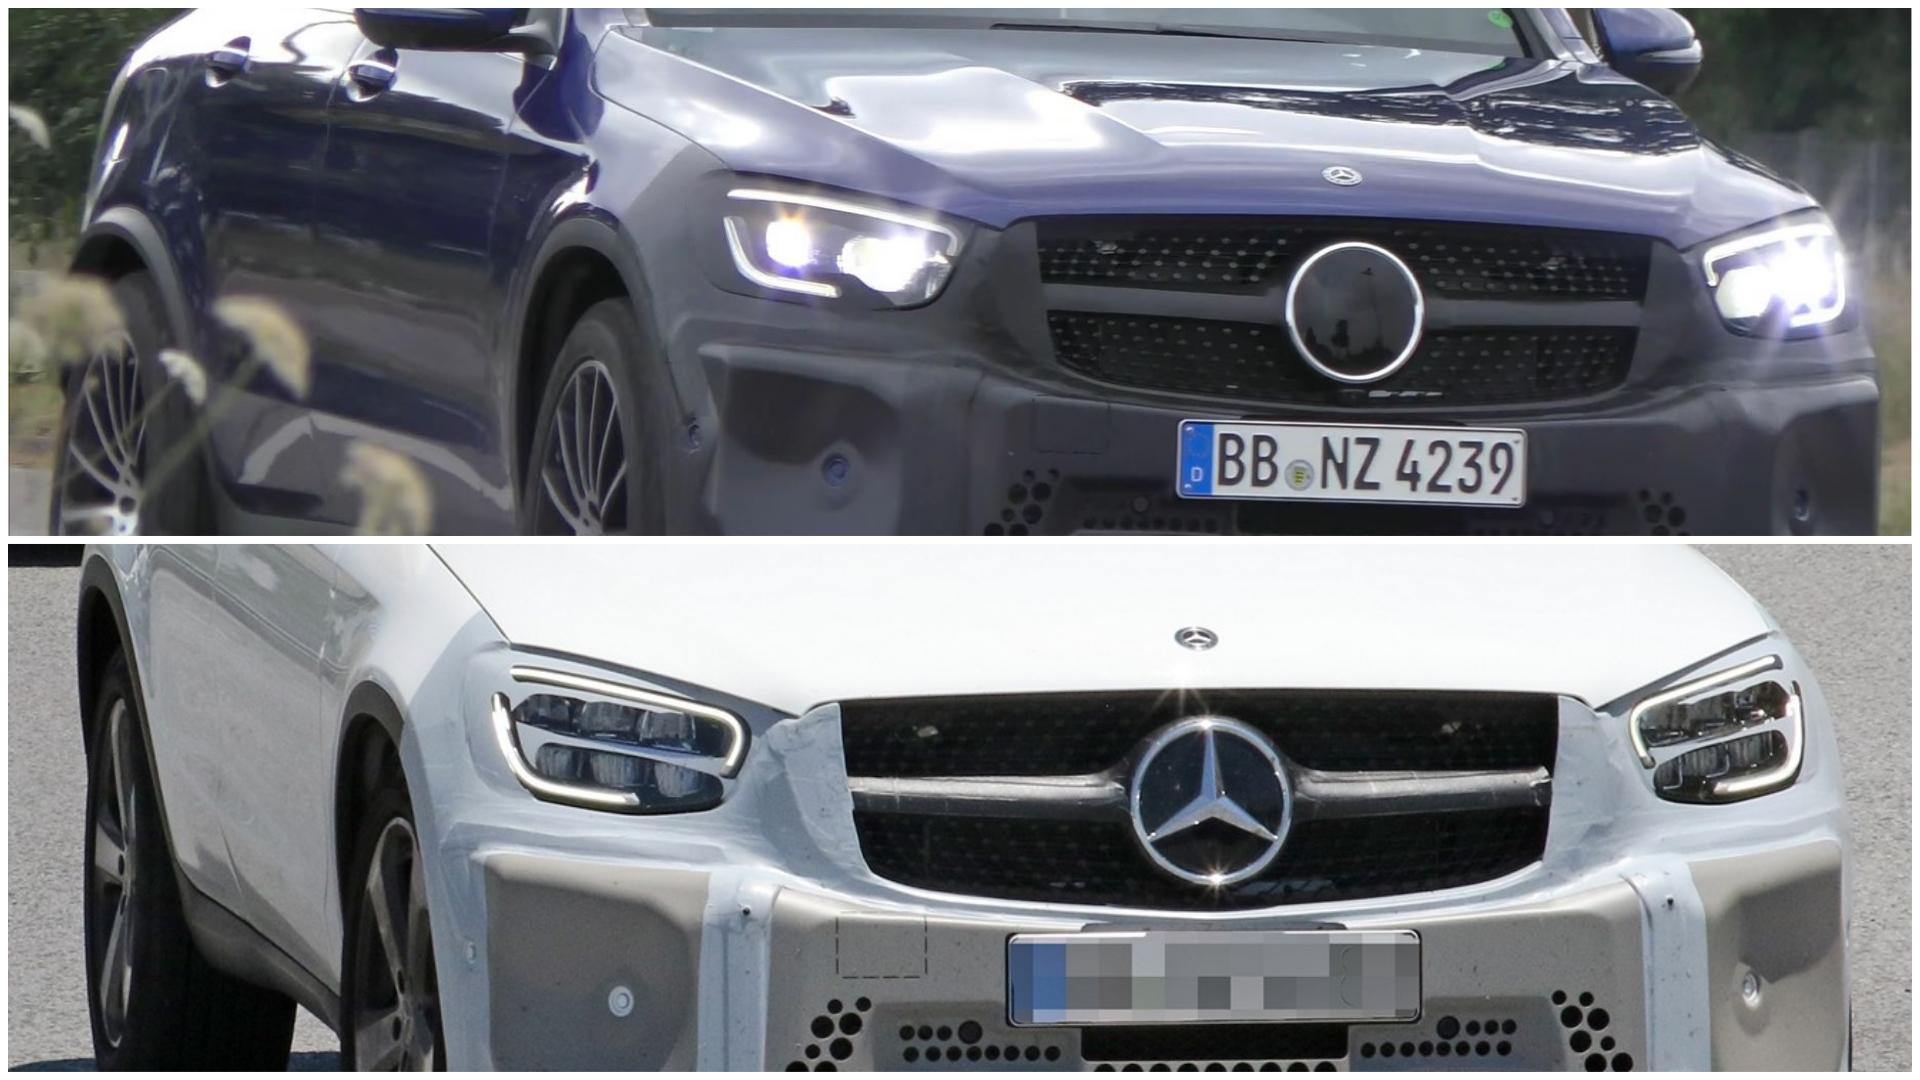 Mercedes Glc Coupe Facelift Shows Two Headlight Designs Autoevolution